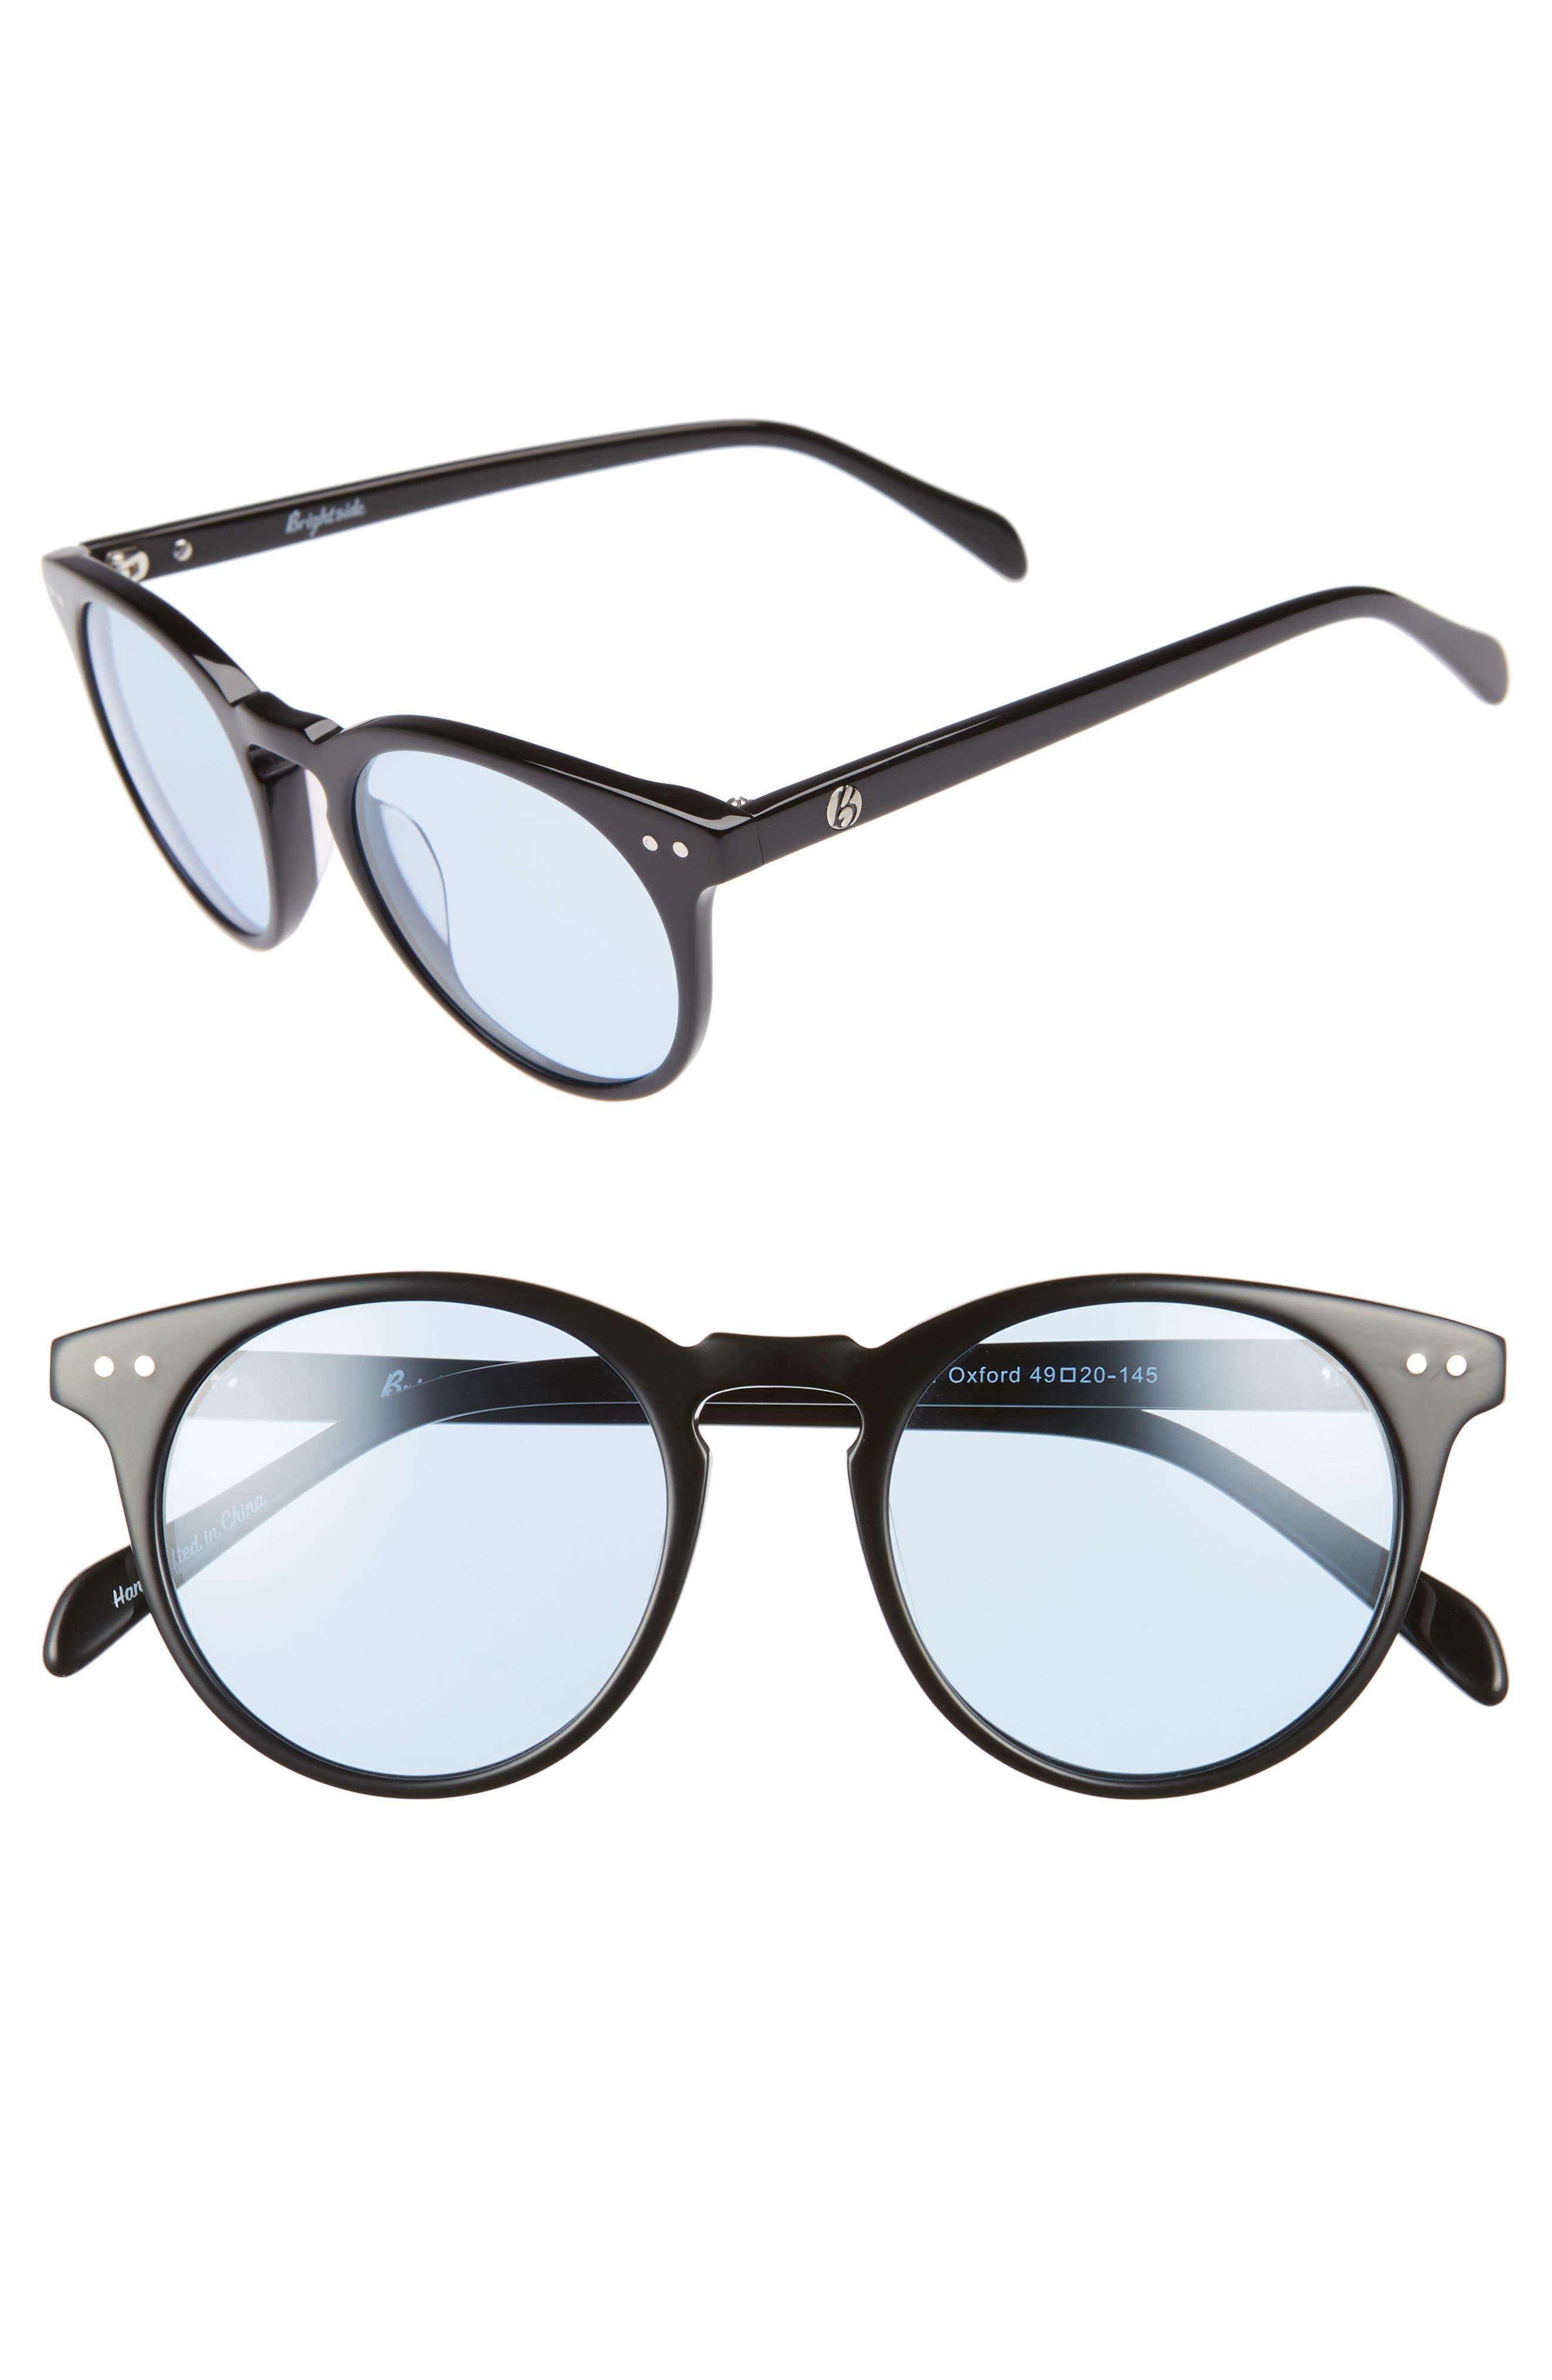 Oxford 49mm Sunglasses,                         Main,                         color, BLACK/ ARCTIC BLUE